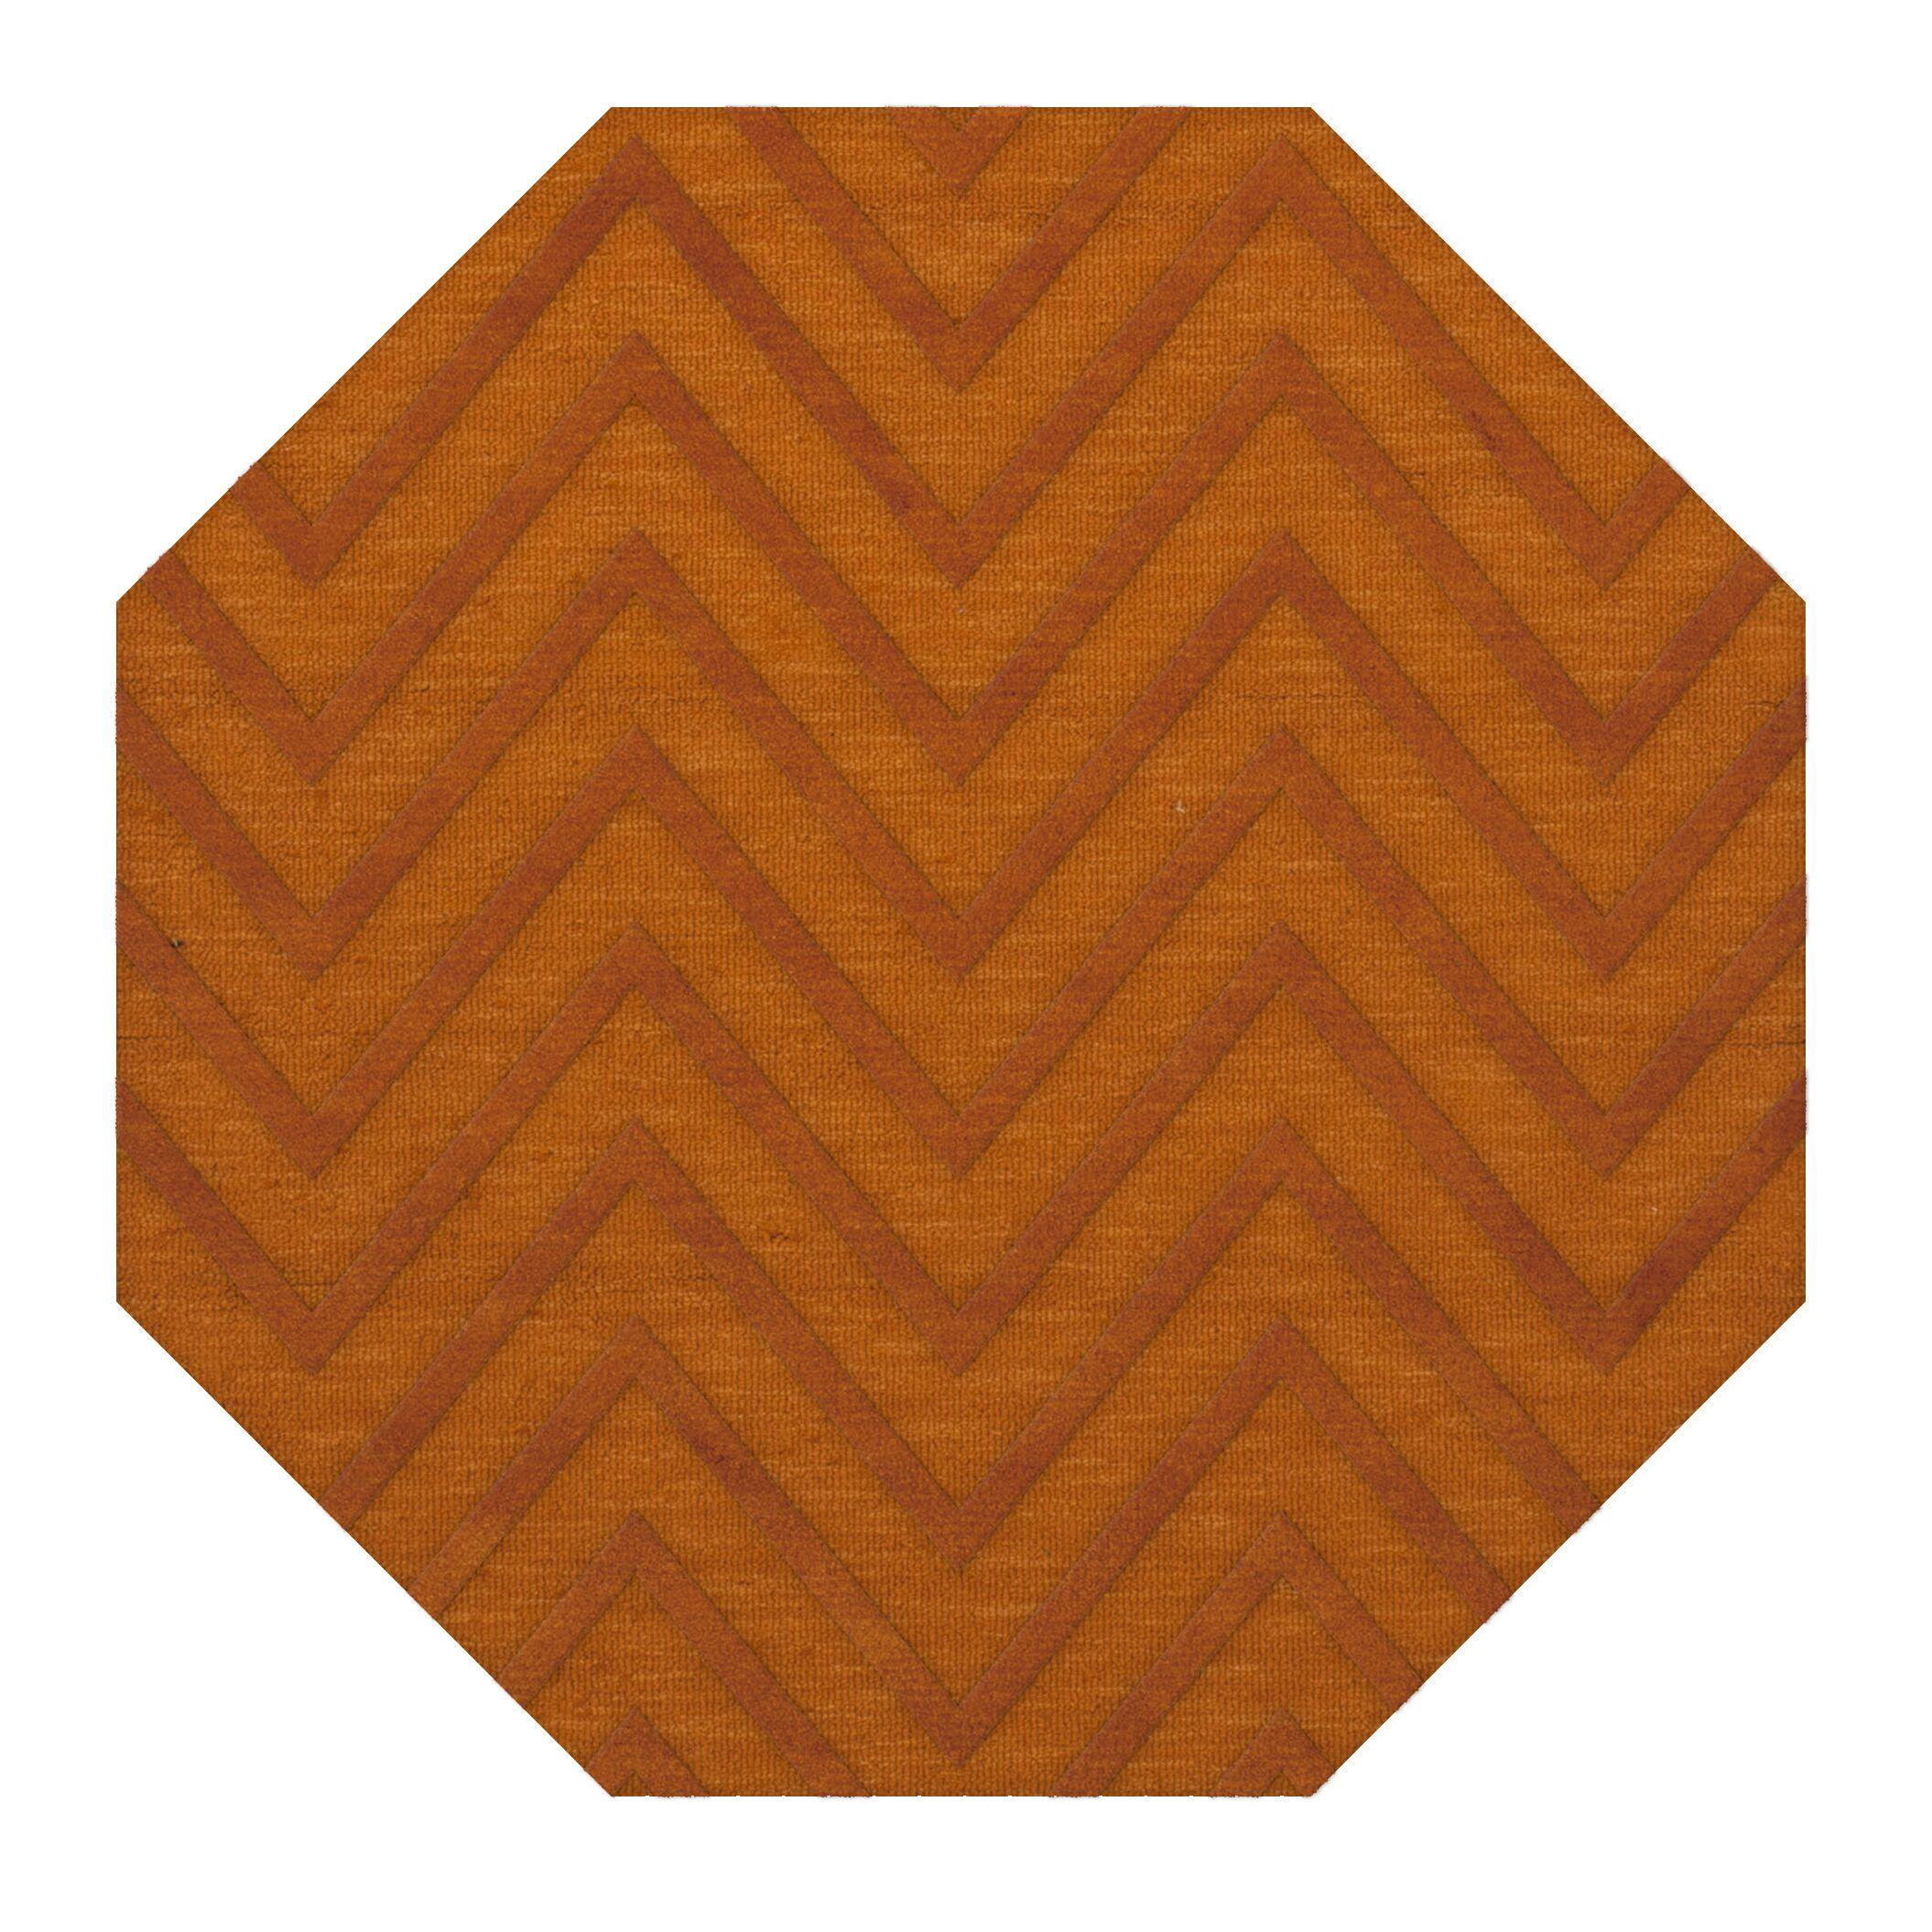 Dover Tufted Wool Orange Area Rug Rug Size: Octagon 10'